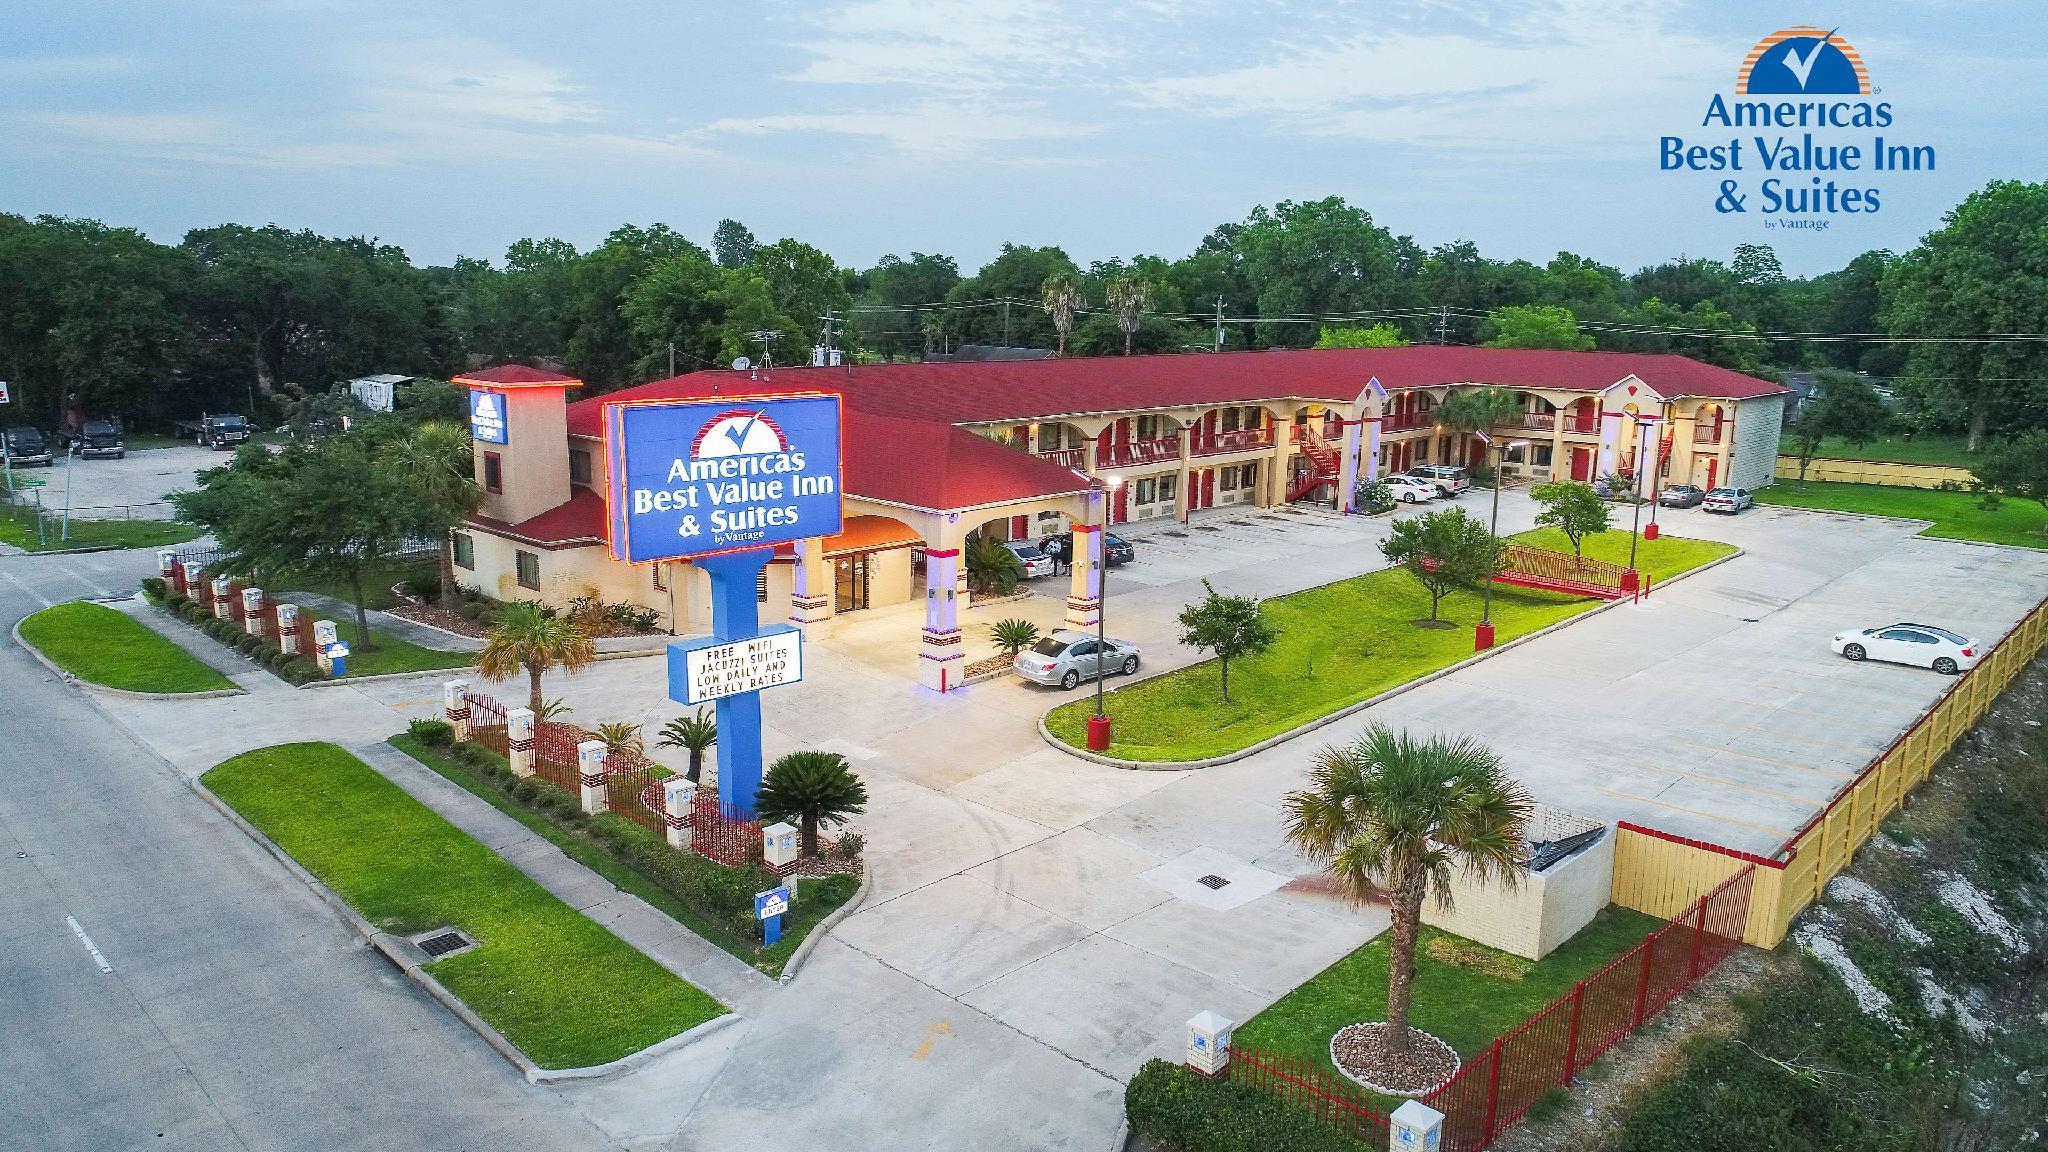 Americas Best Value Inn And Suites Houston NE